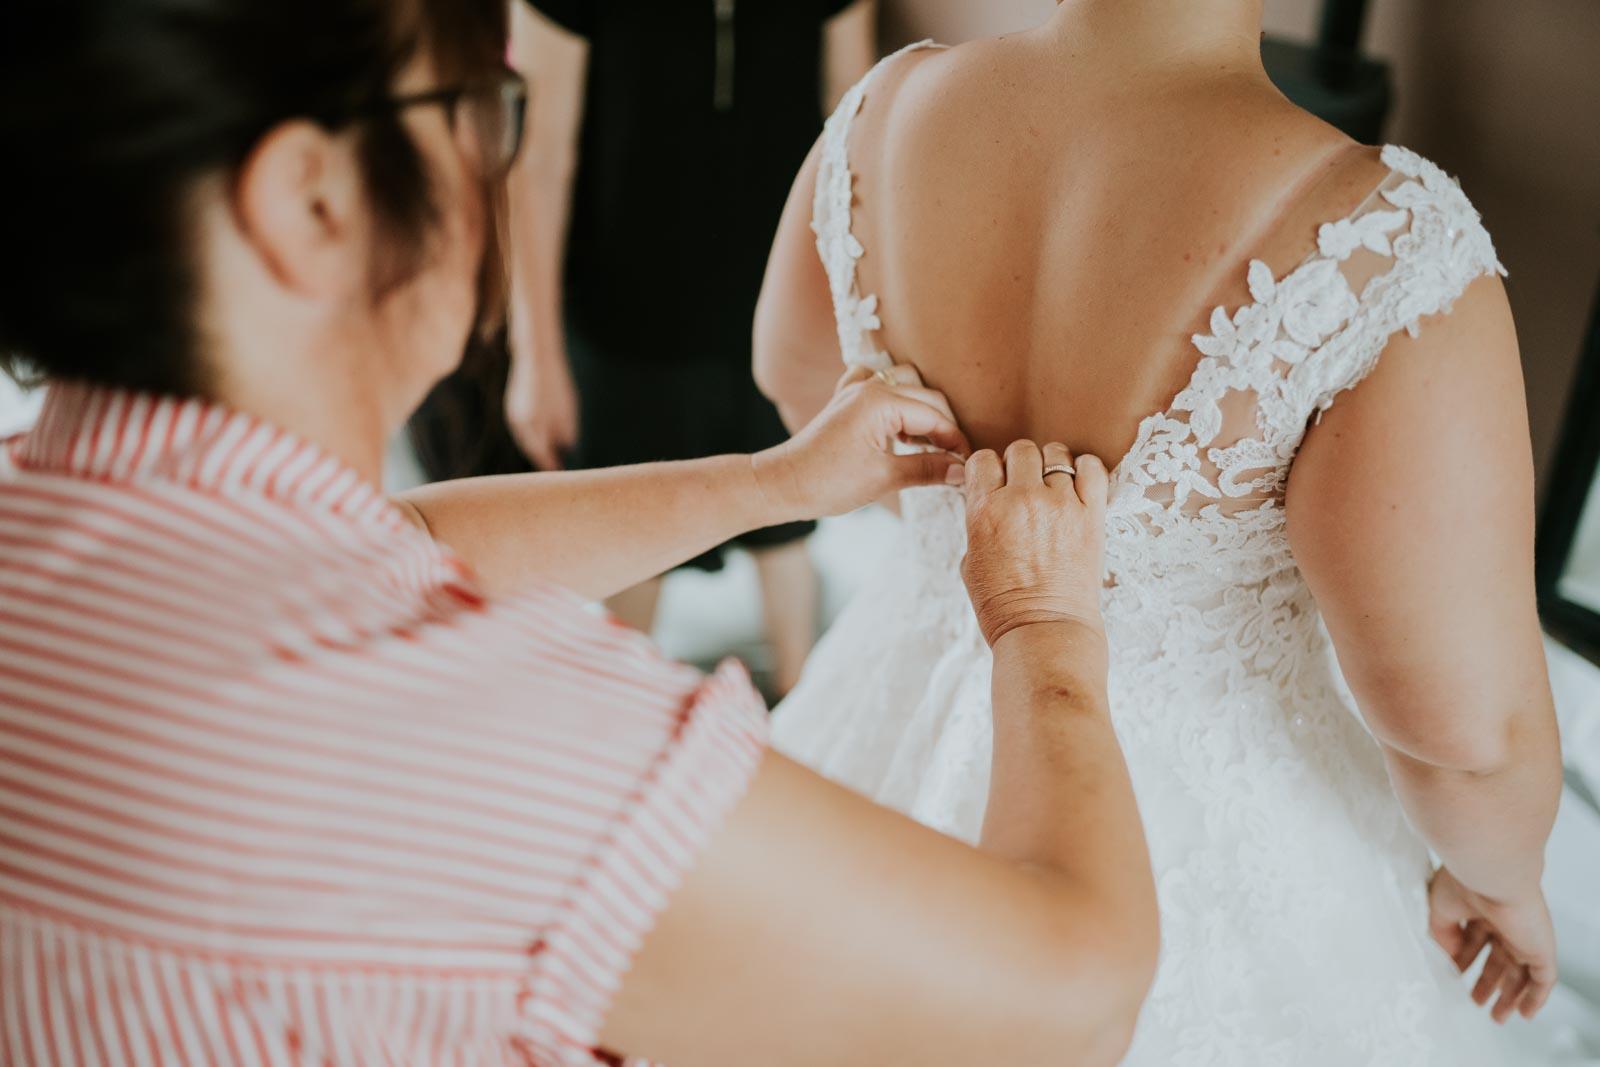 Fermeture de la robe…